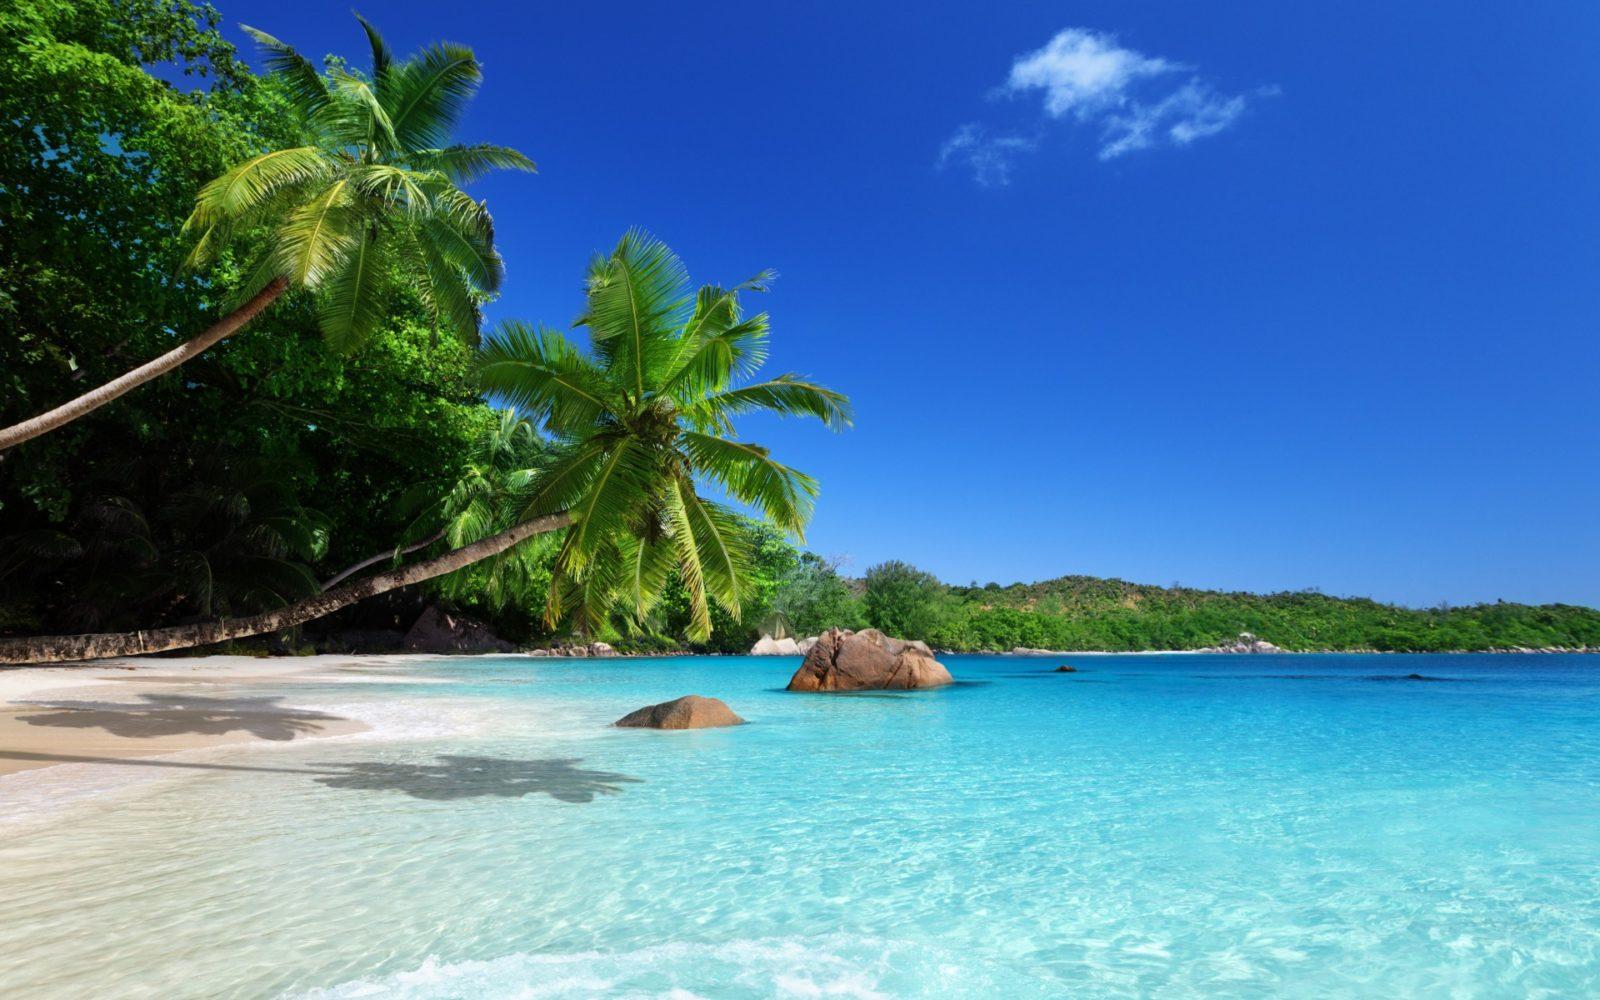 Hawaiian Finds Real Paradise In Panama Punta Pacifica